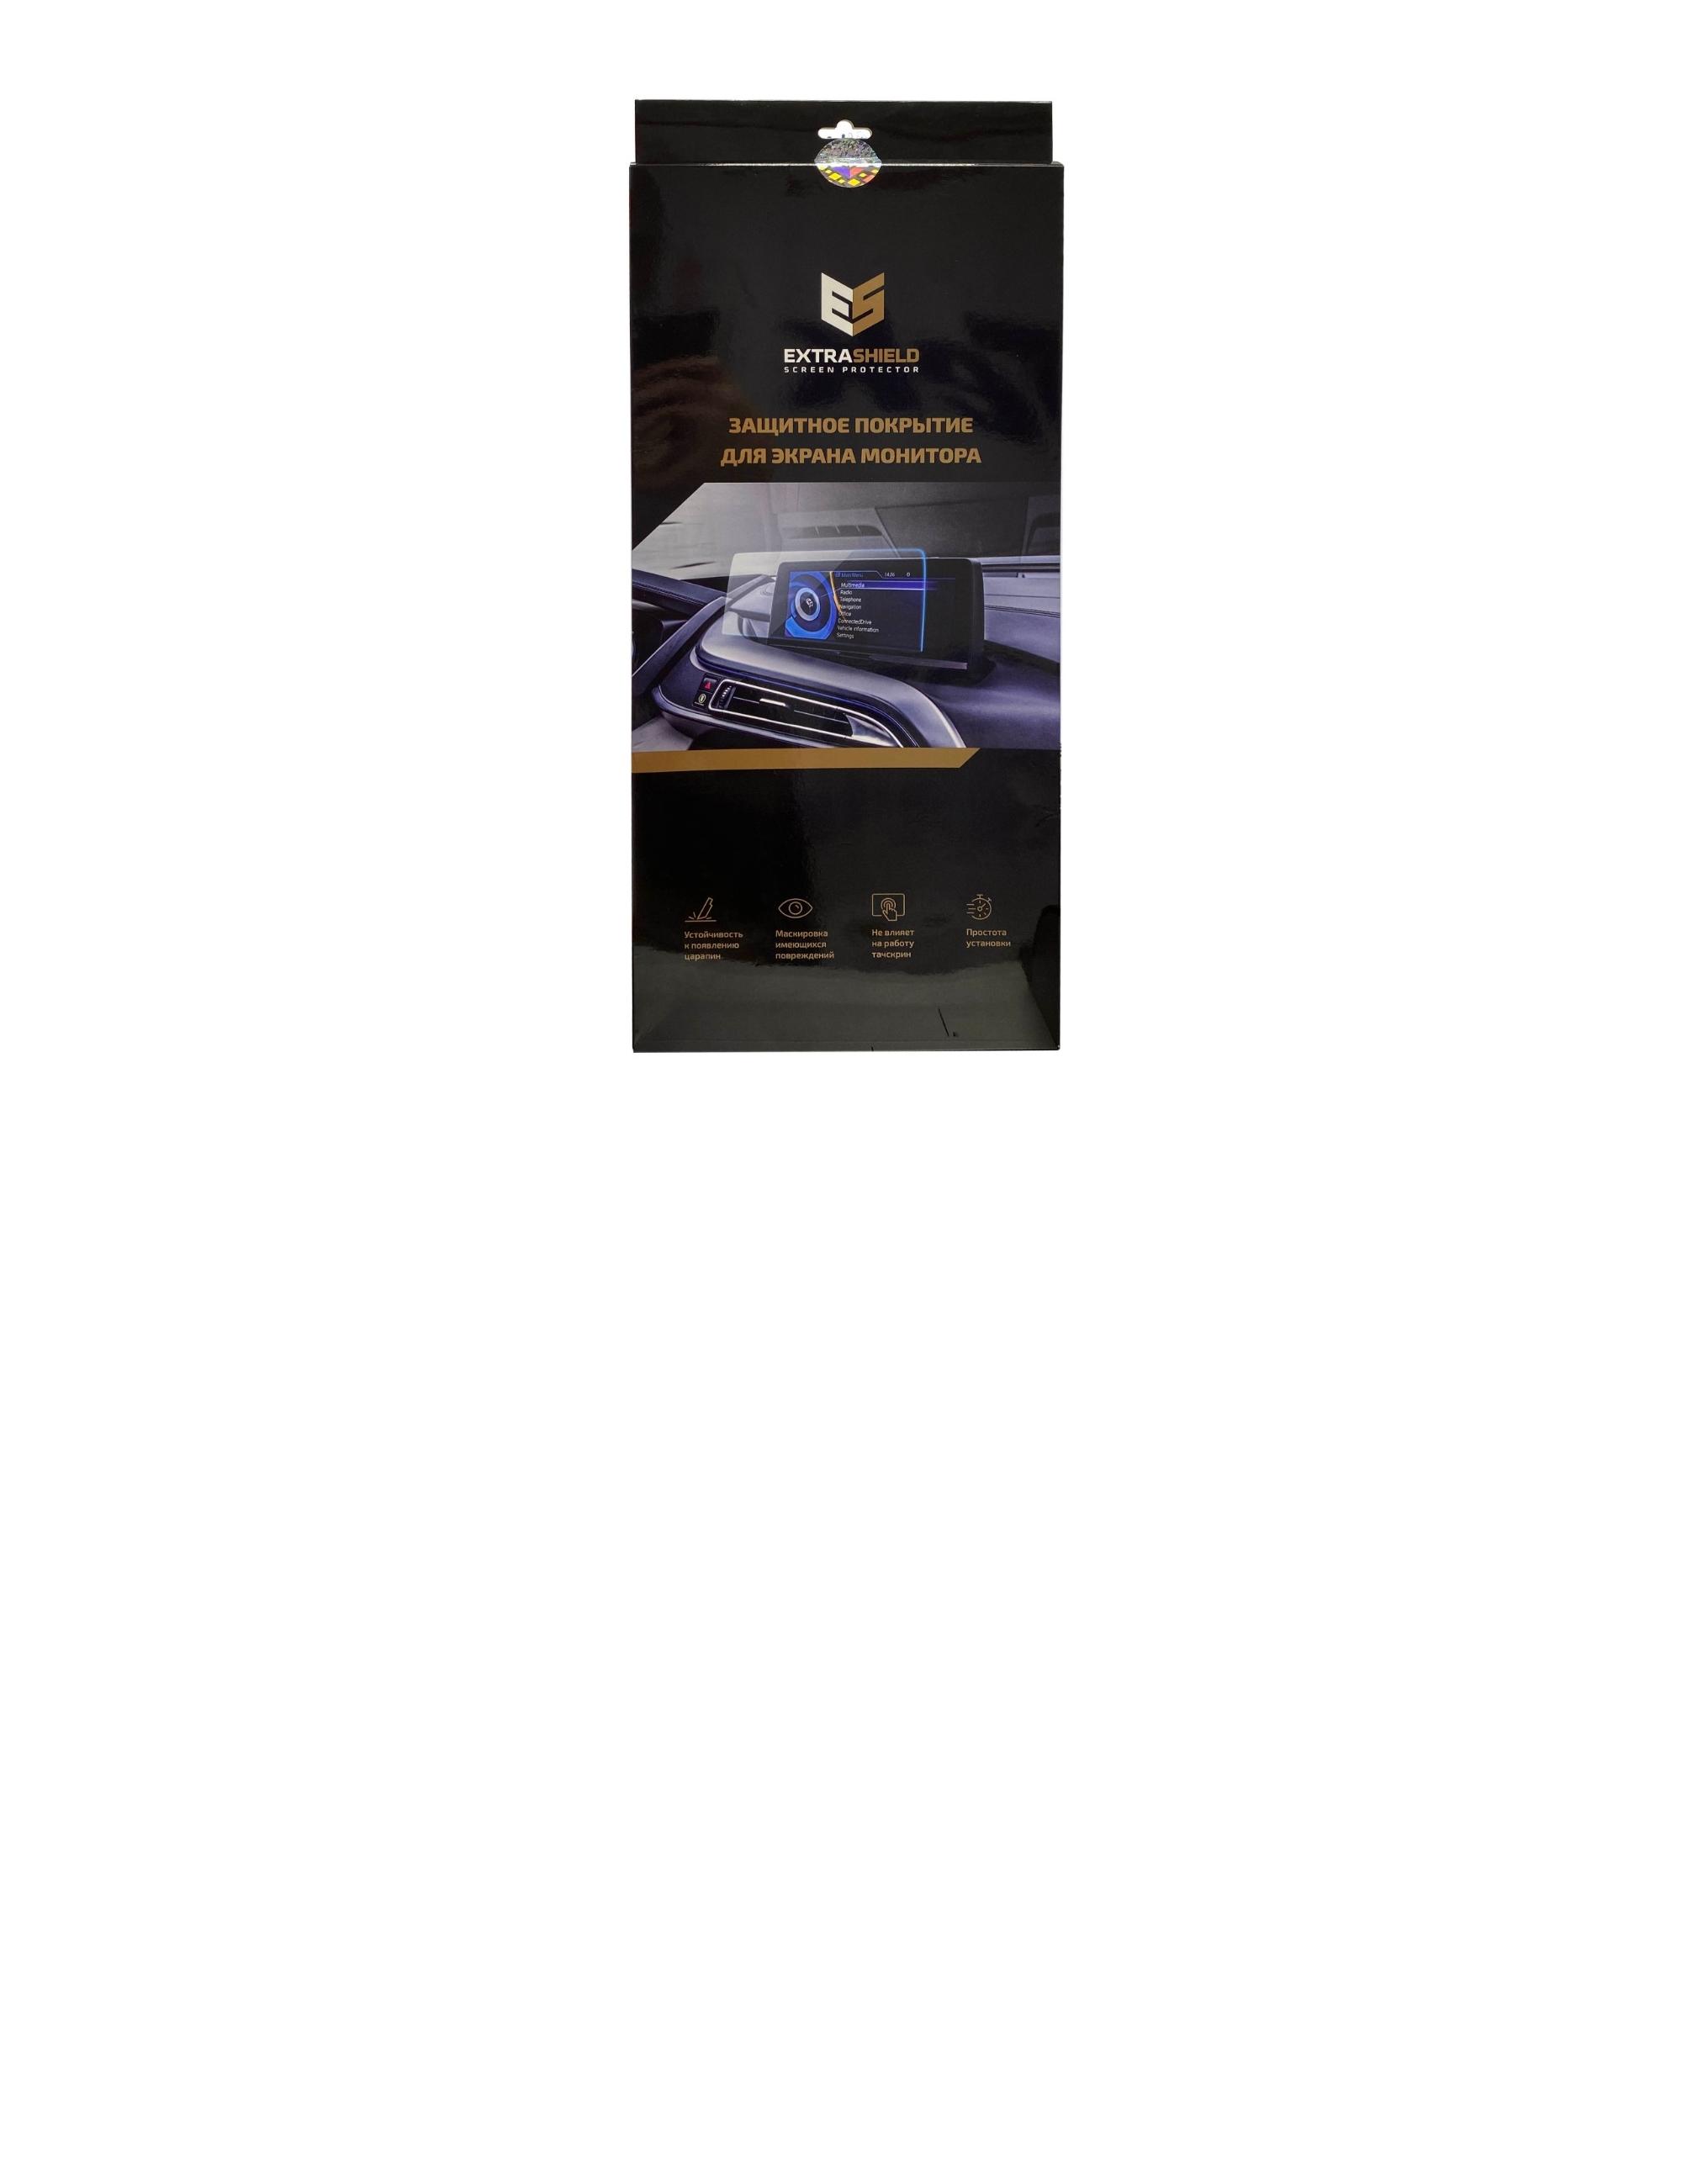 Audi Q5 II (FY) дорестайлинг 2016 - 2019 мультимедиа MMI 7 Защитное стекло Глянец